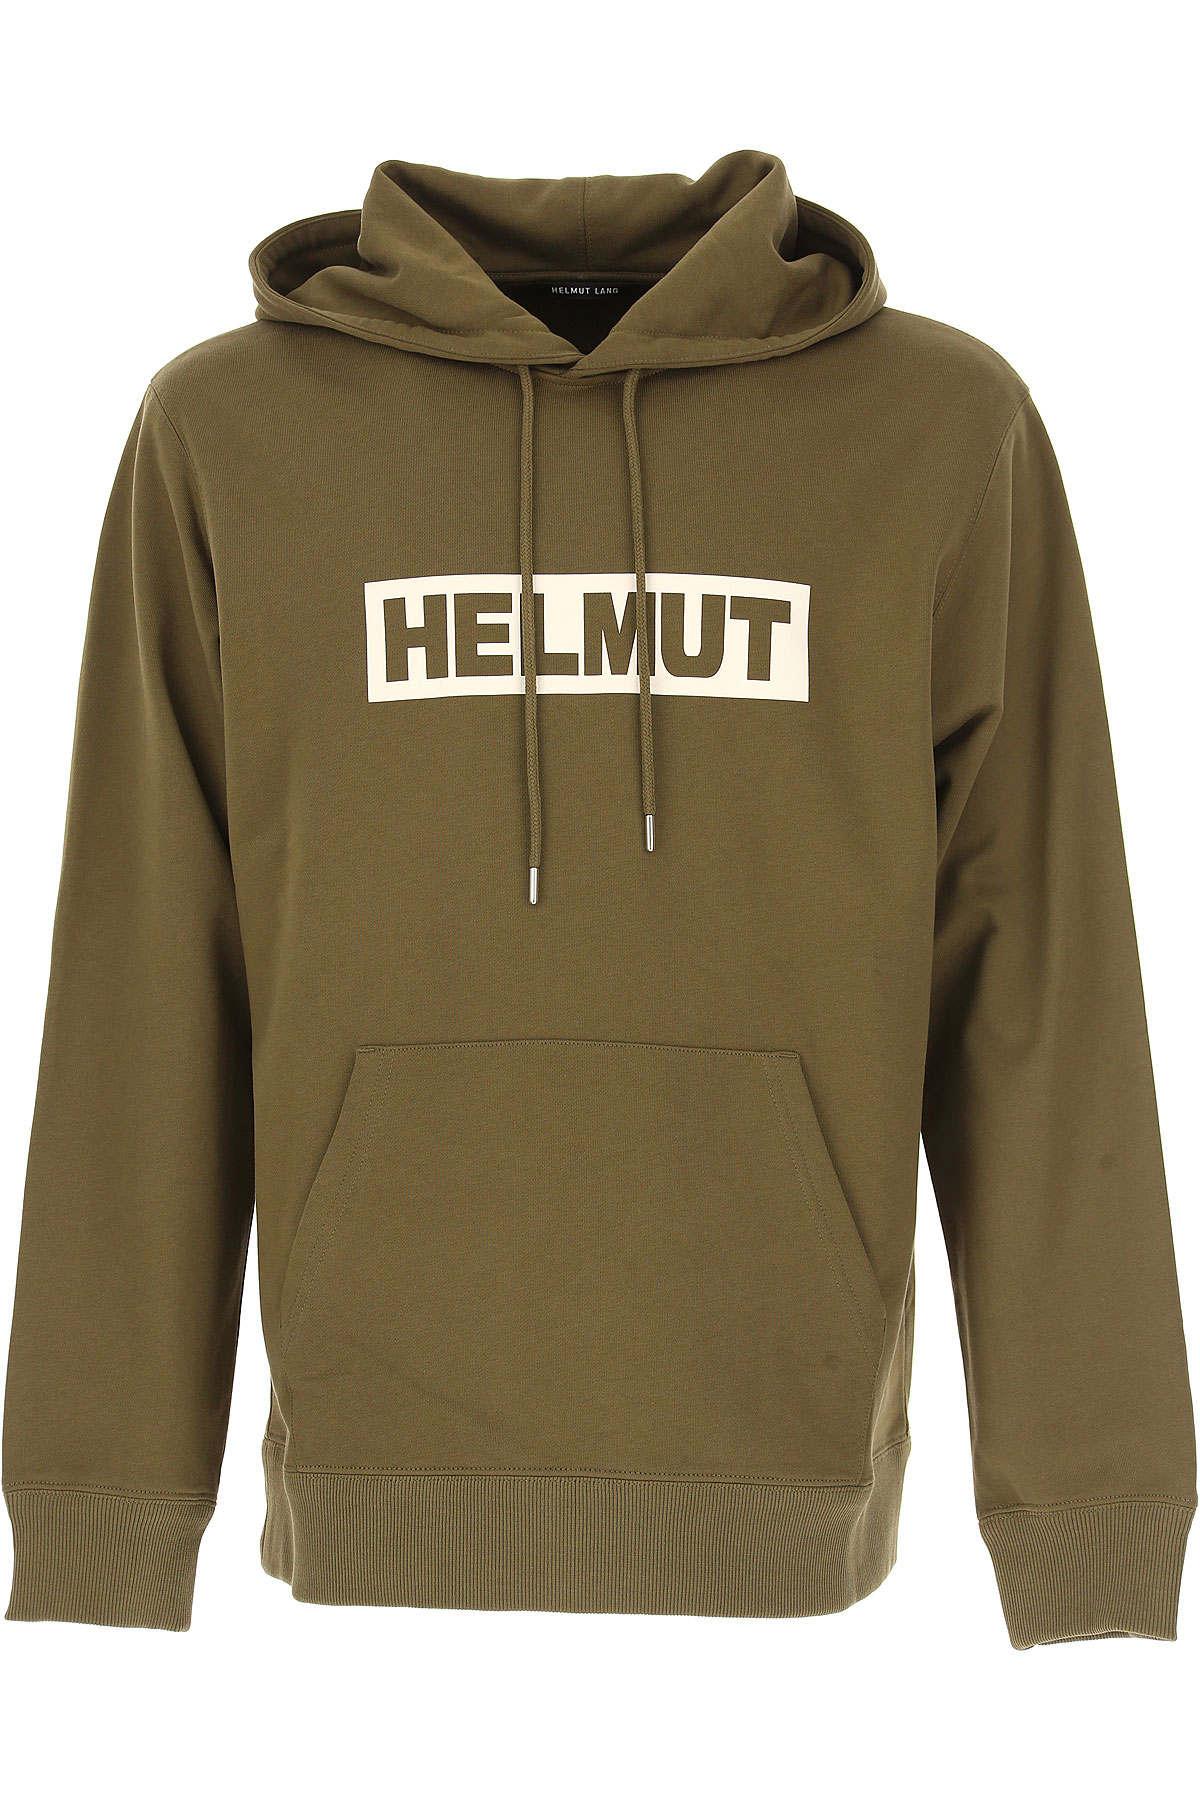 Image of Helmut Lang Sweatshirt for Men, Kaki, Cotton, 2017, L S